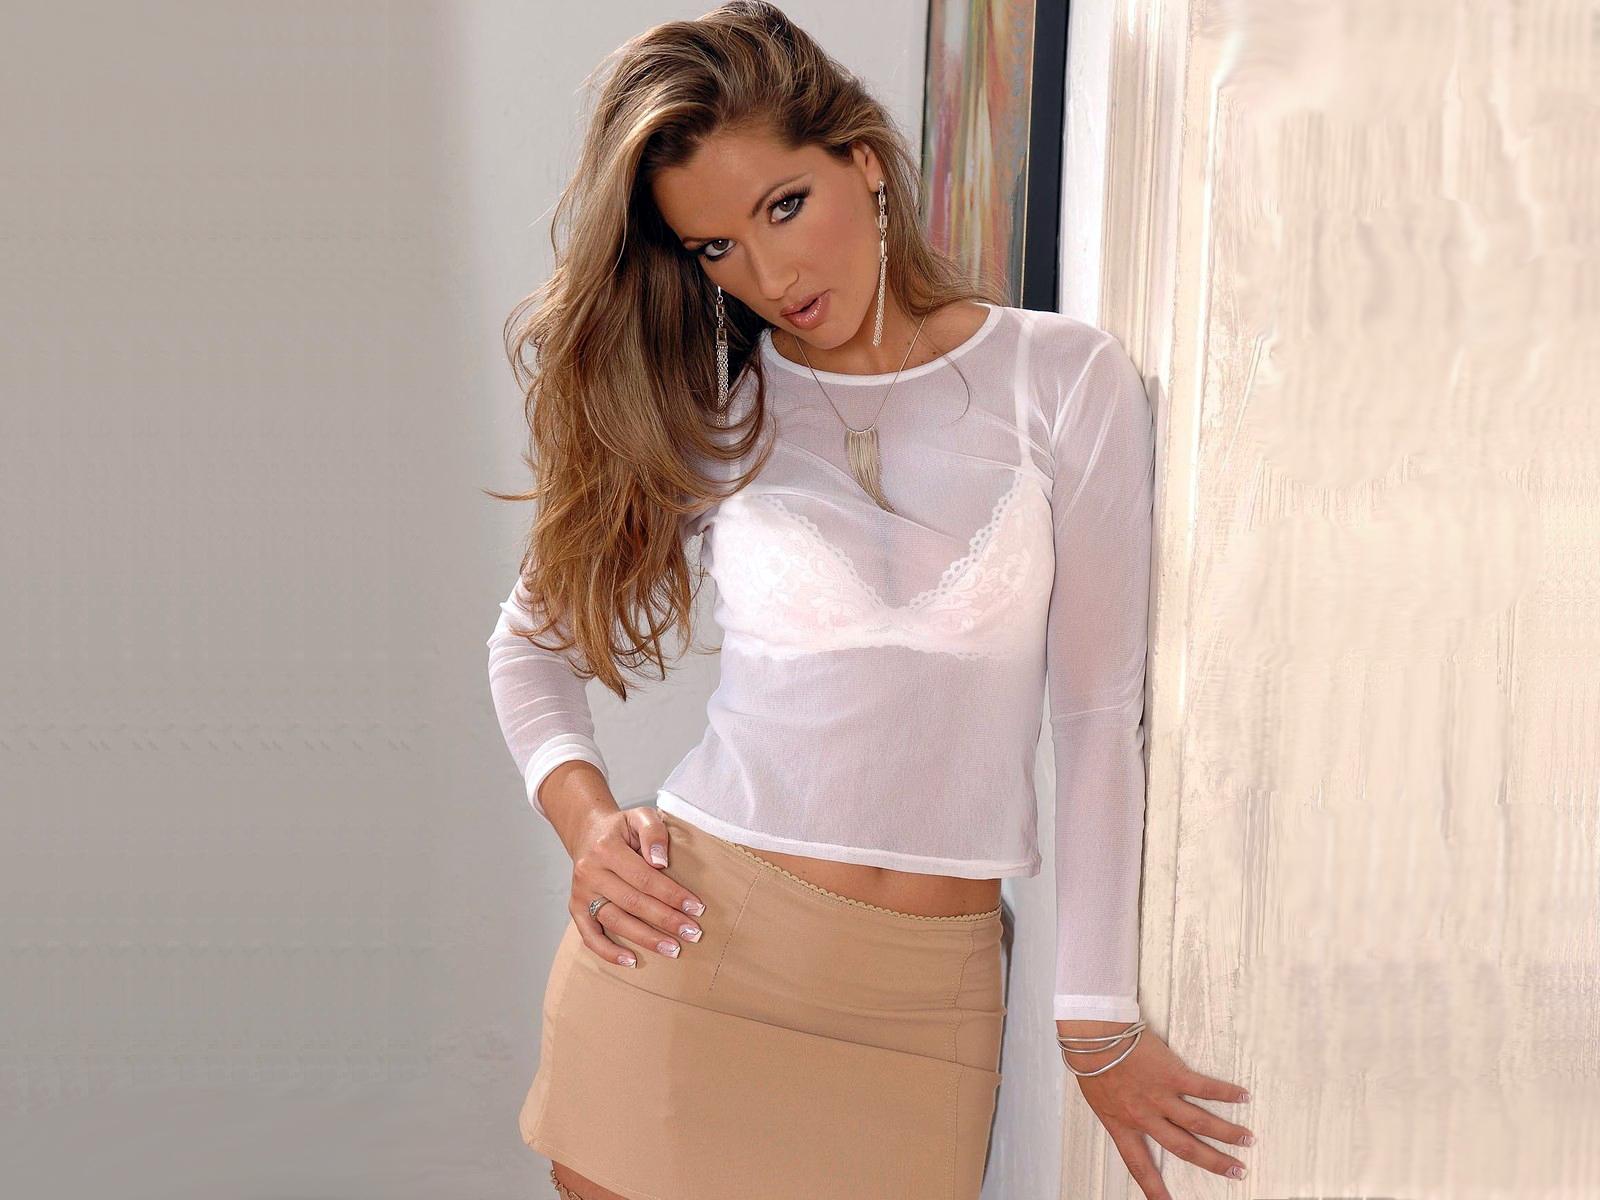 Телки в блузках фото 11 фотография